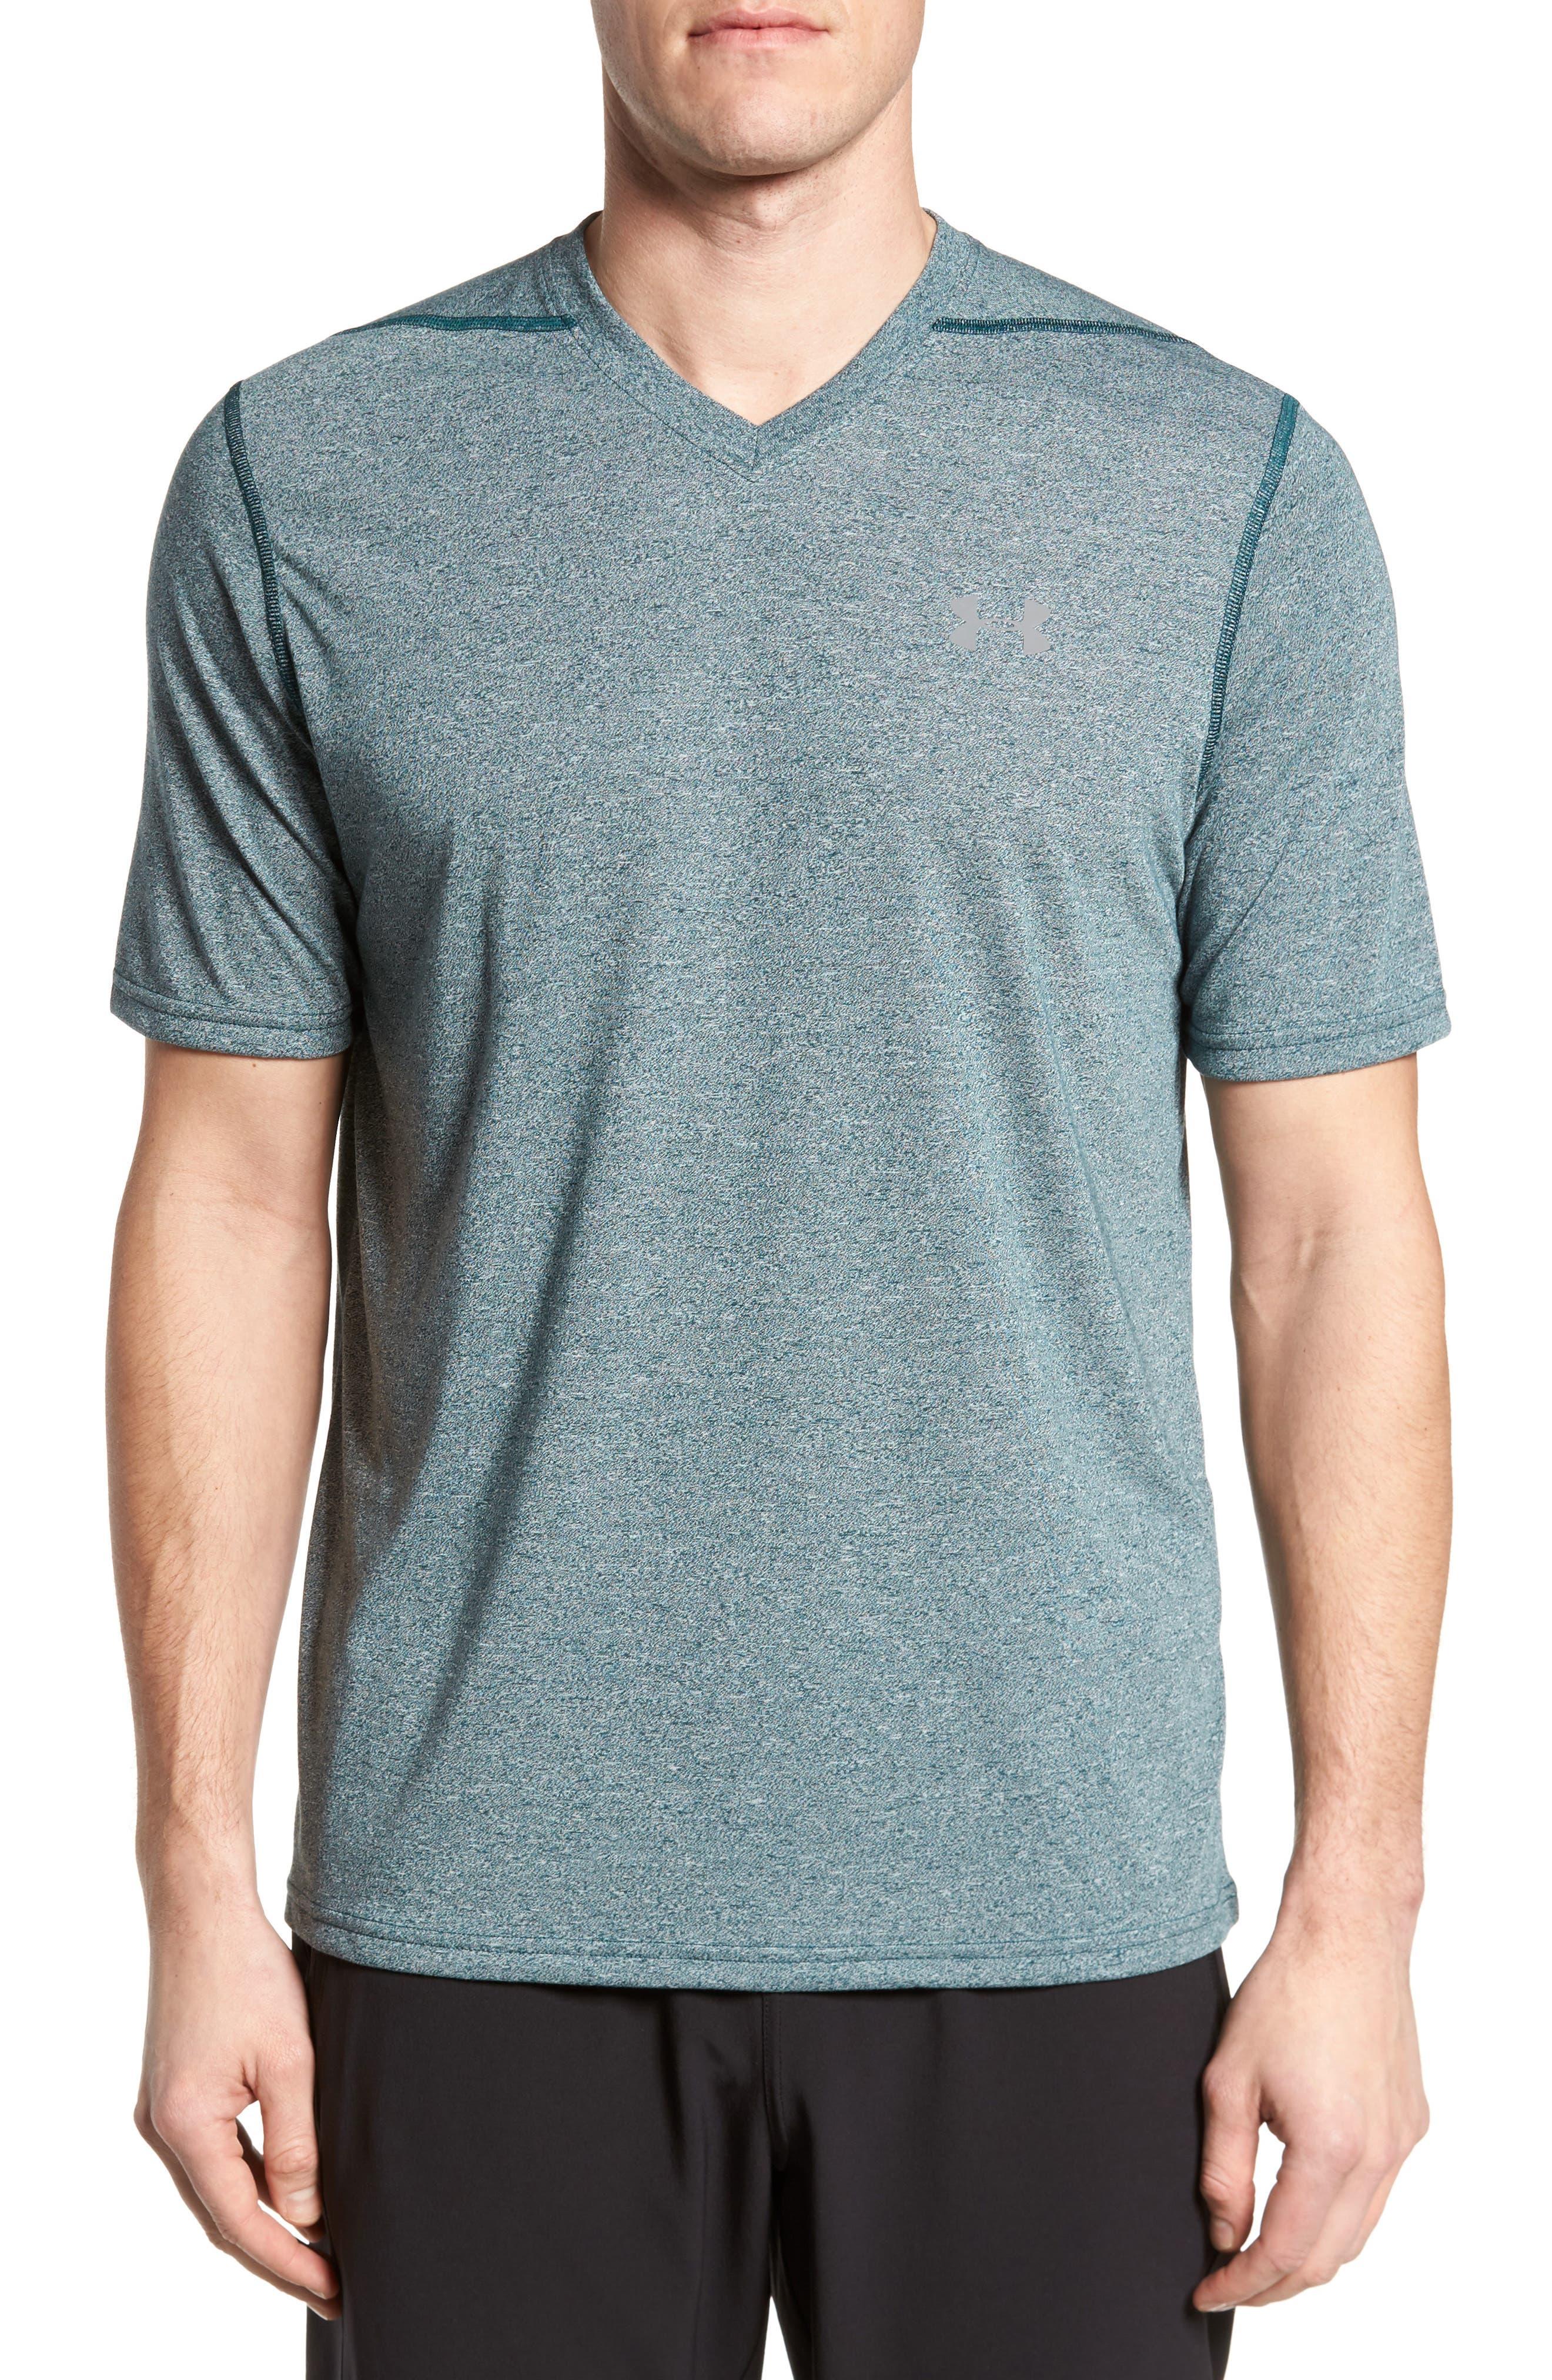 Regular Fit Threadborne T-Shirt,                         Main,                         color, 300